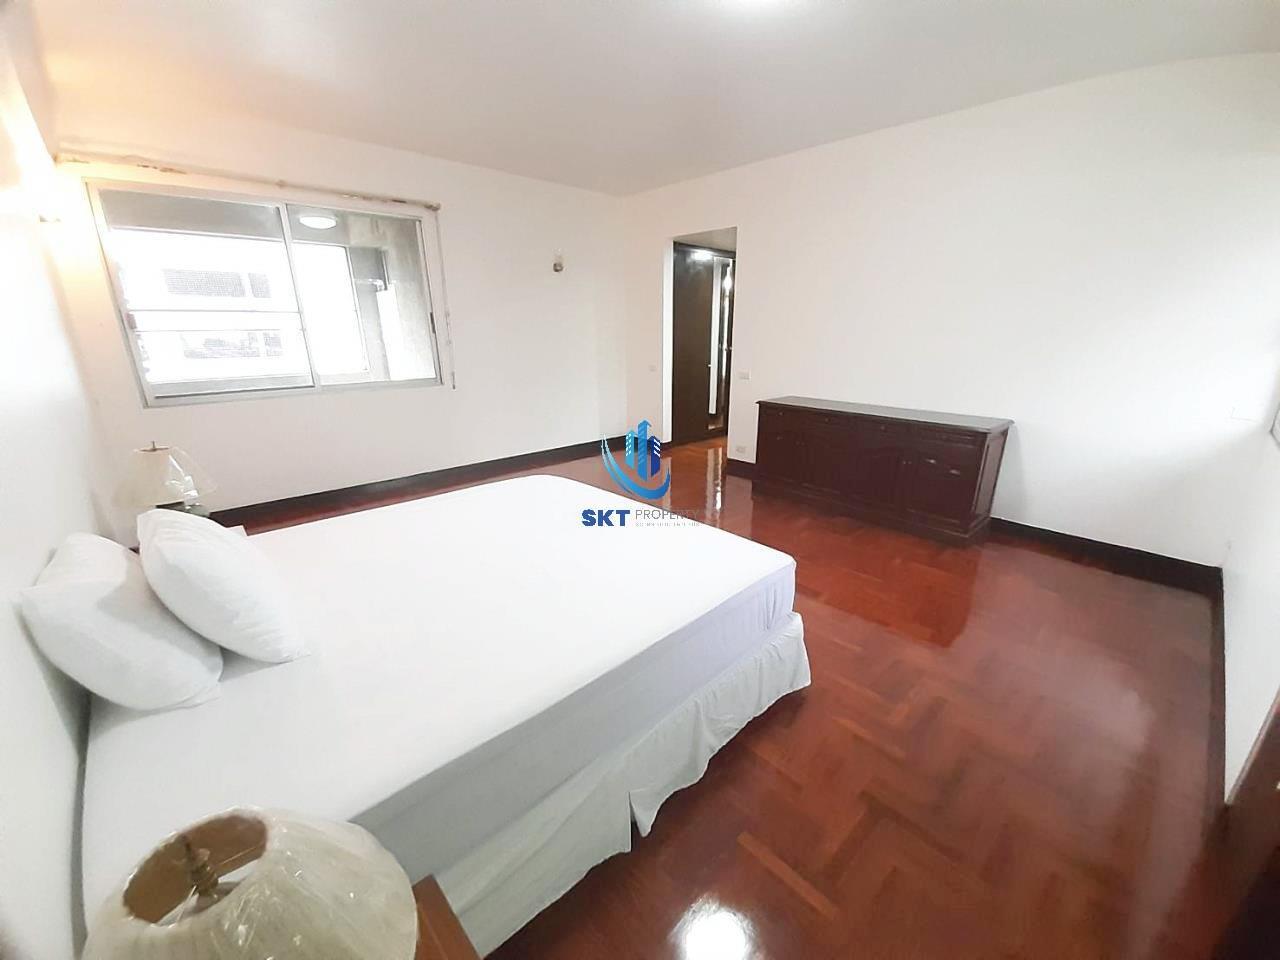 Sukritta Property Agency's Kanta mansion sukhumvit 26 - Bts Prompong 6